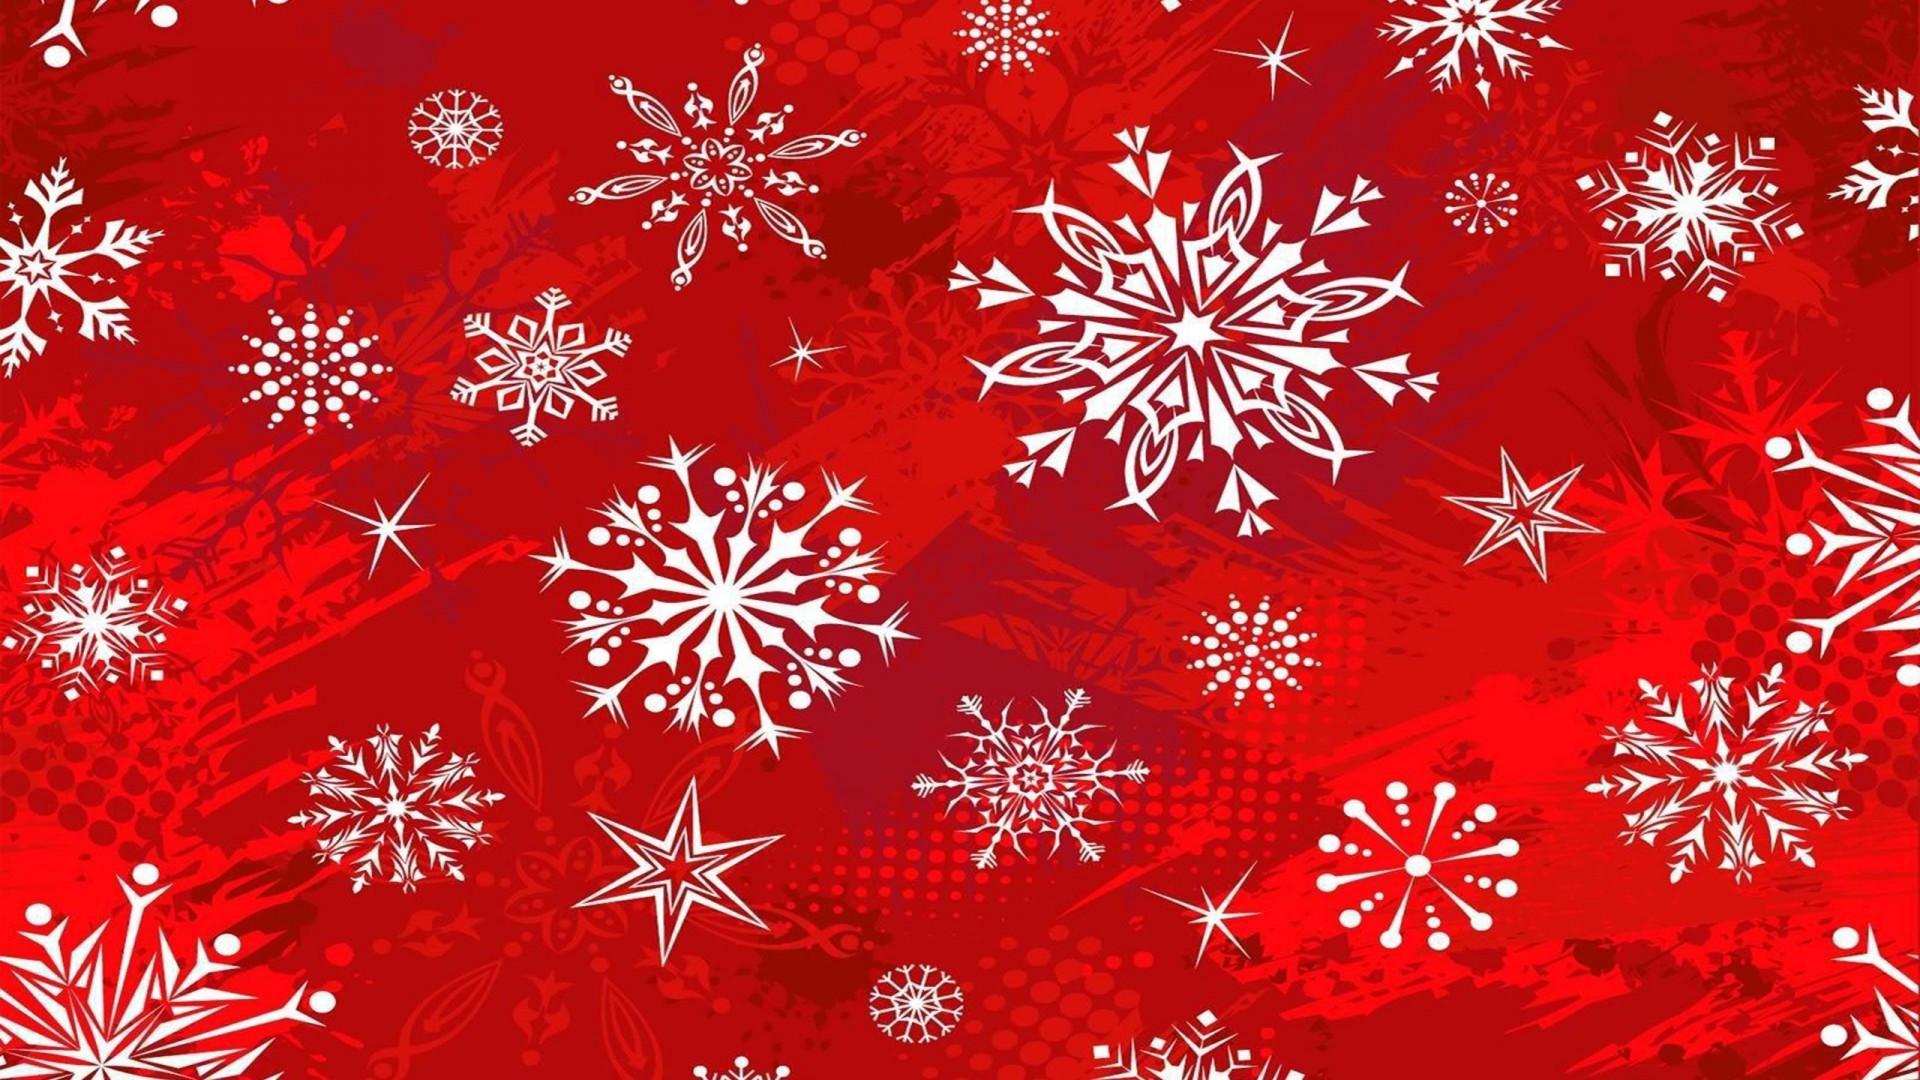 3d Xmas Tree Live Wallpaper 3d Christmas Backgrounds 183 ①